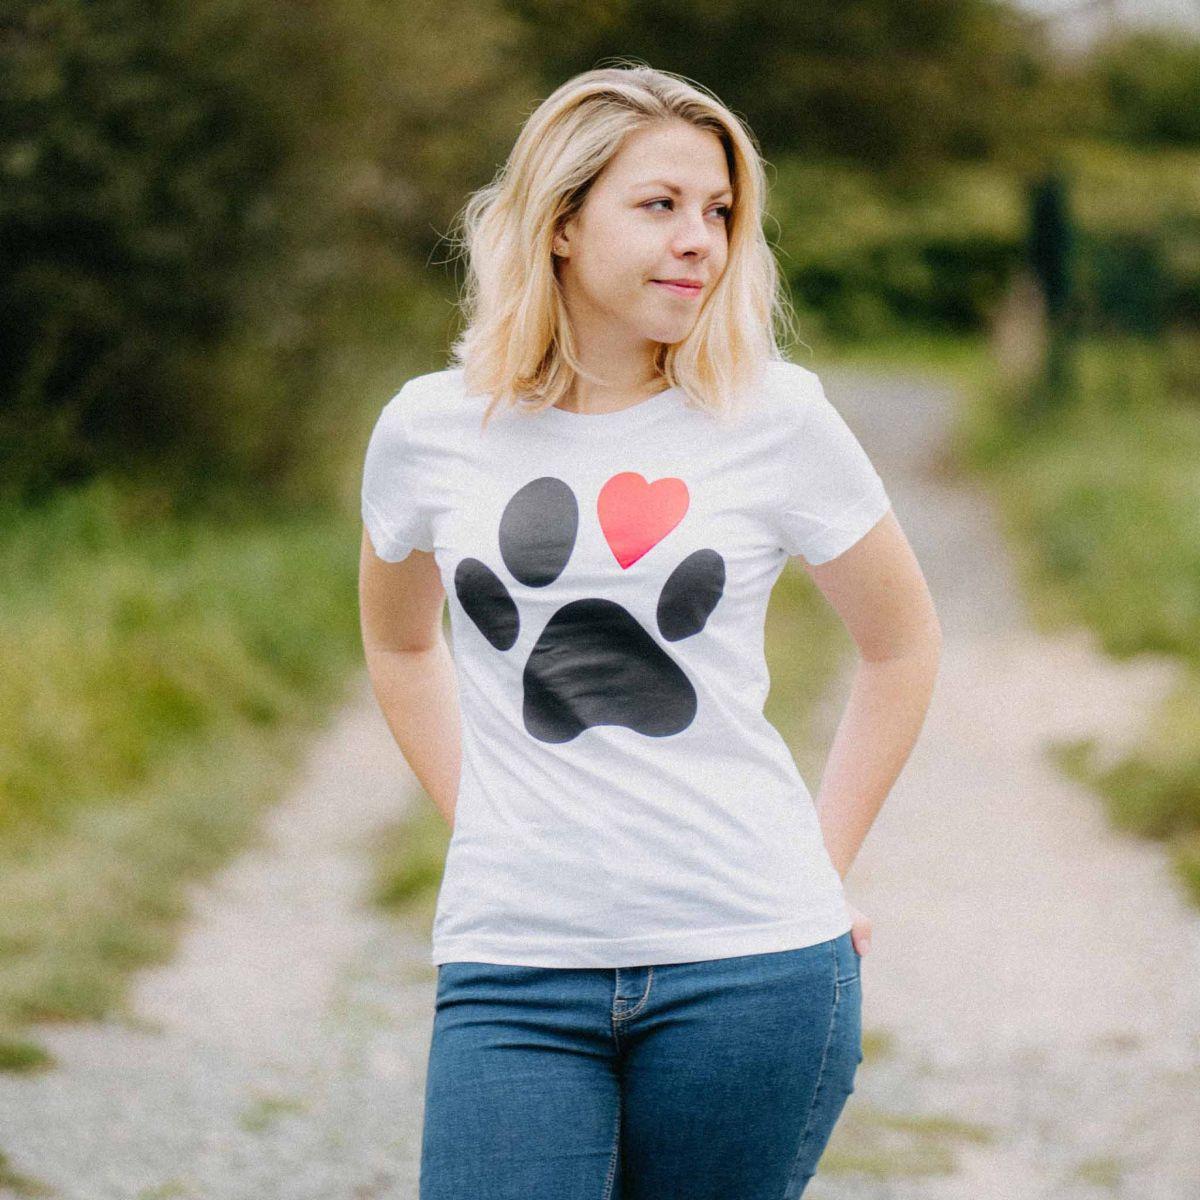 Damen T-Shirt - Pfote p2